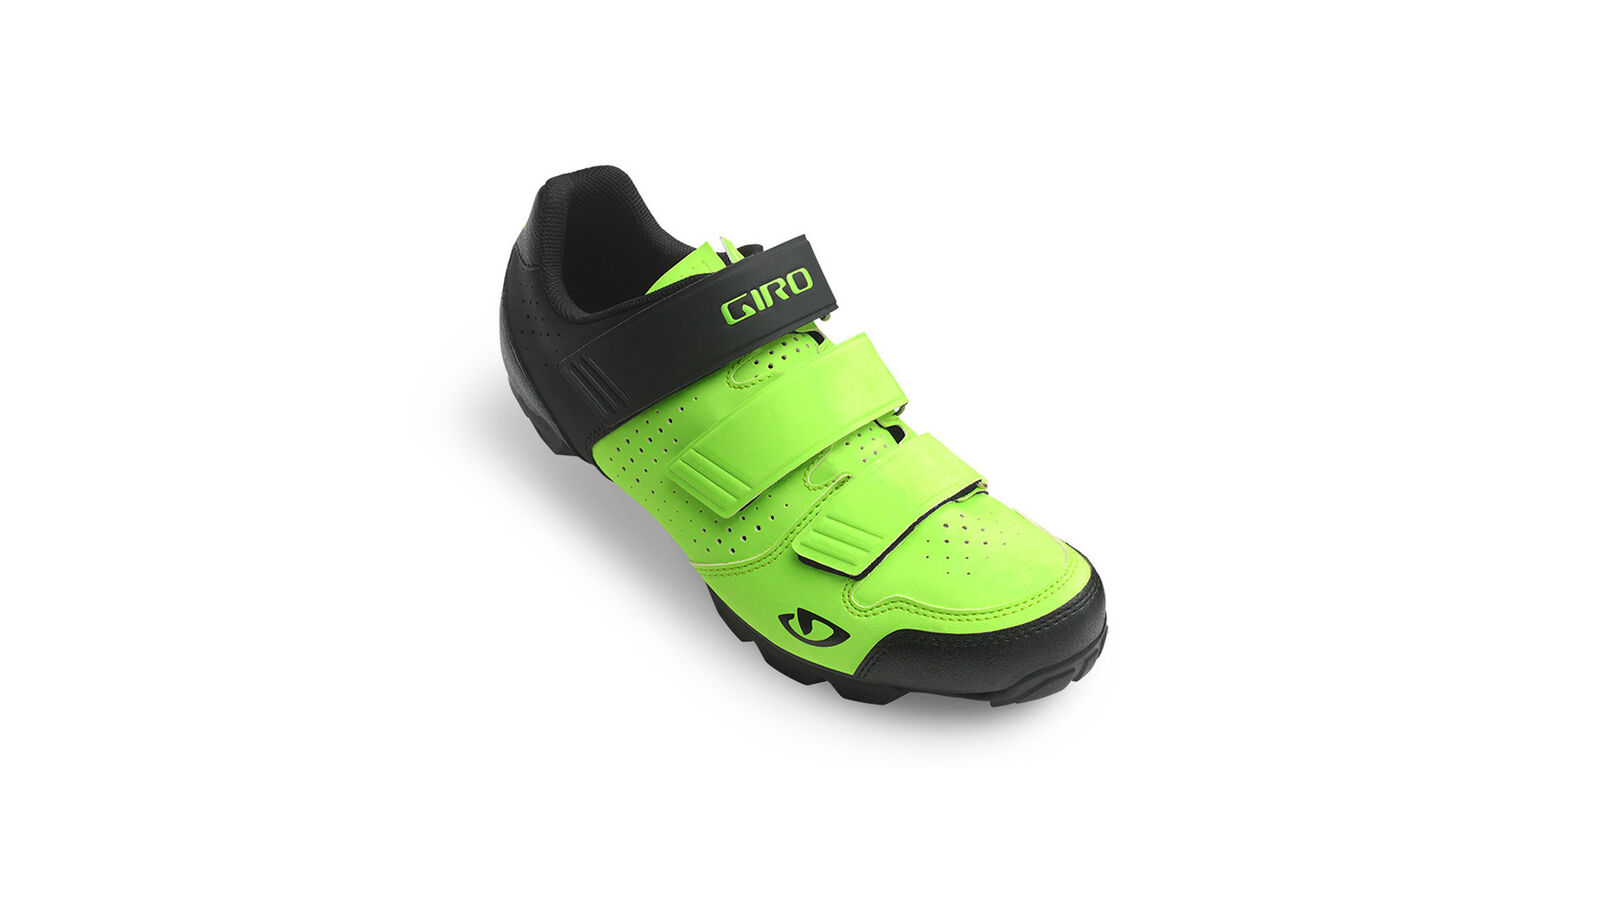 Giro Radsautope autobide R verde Traspirante odore frenarli tinta sintetico